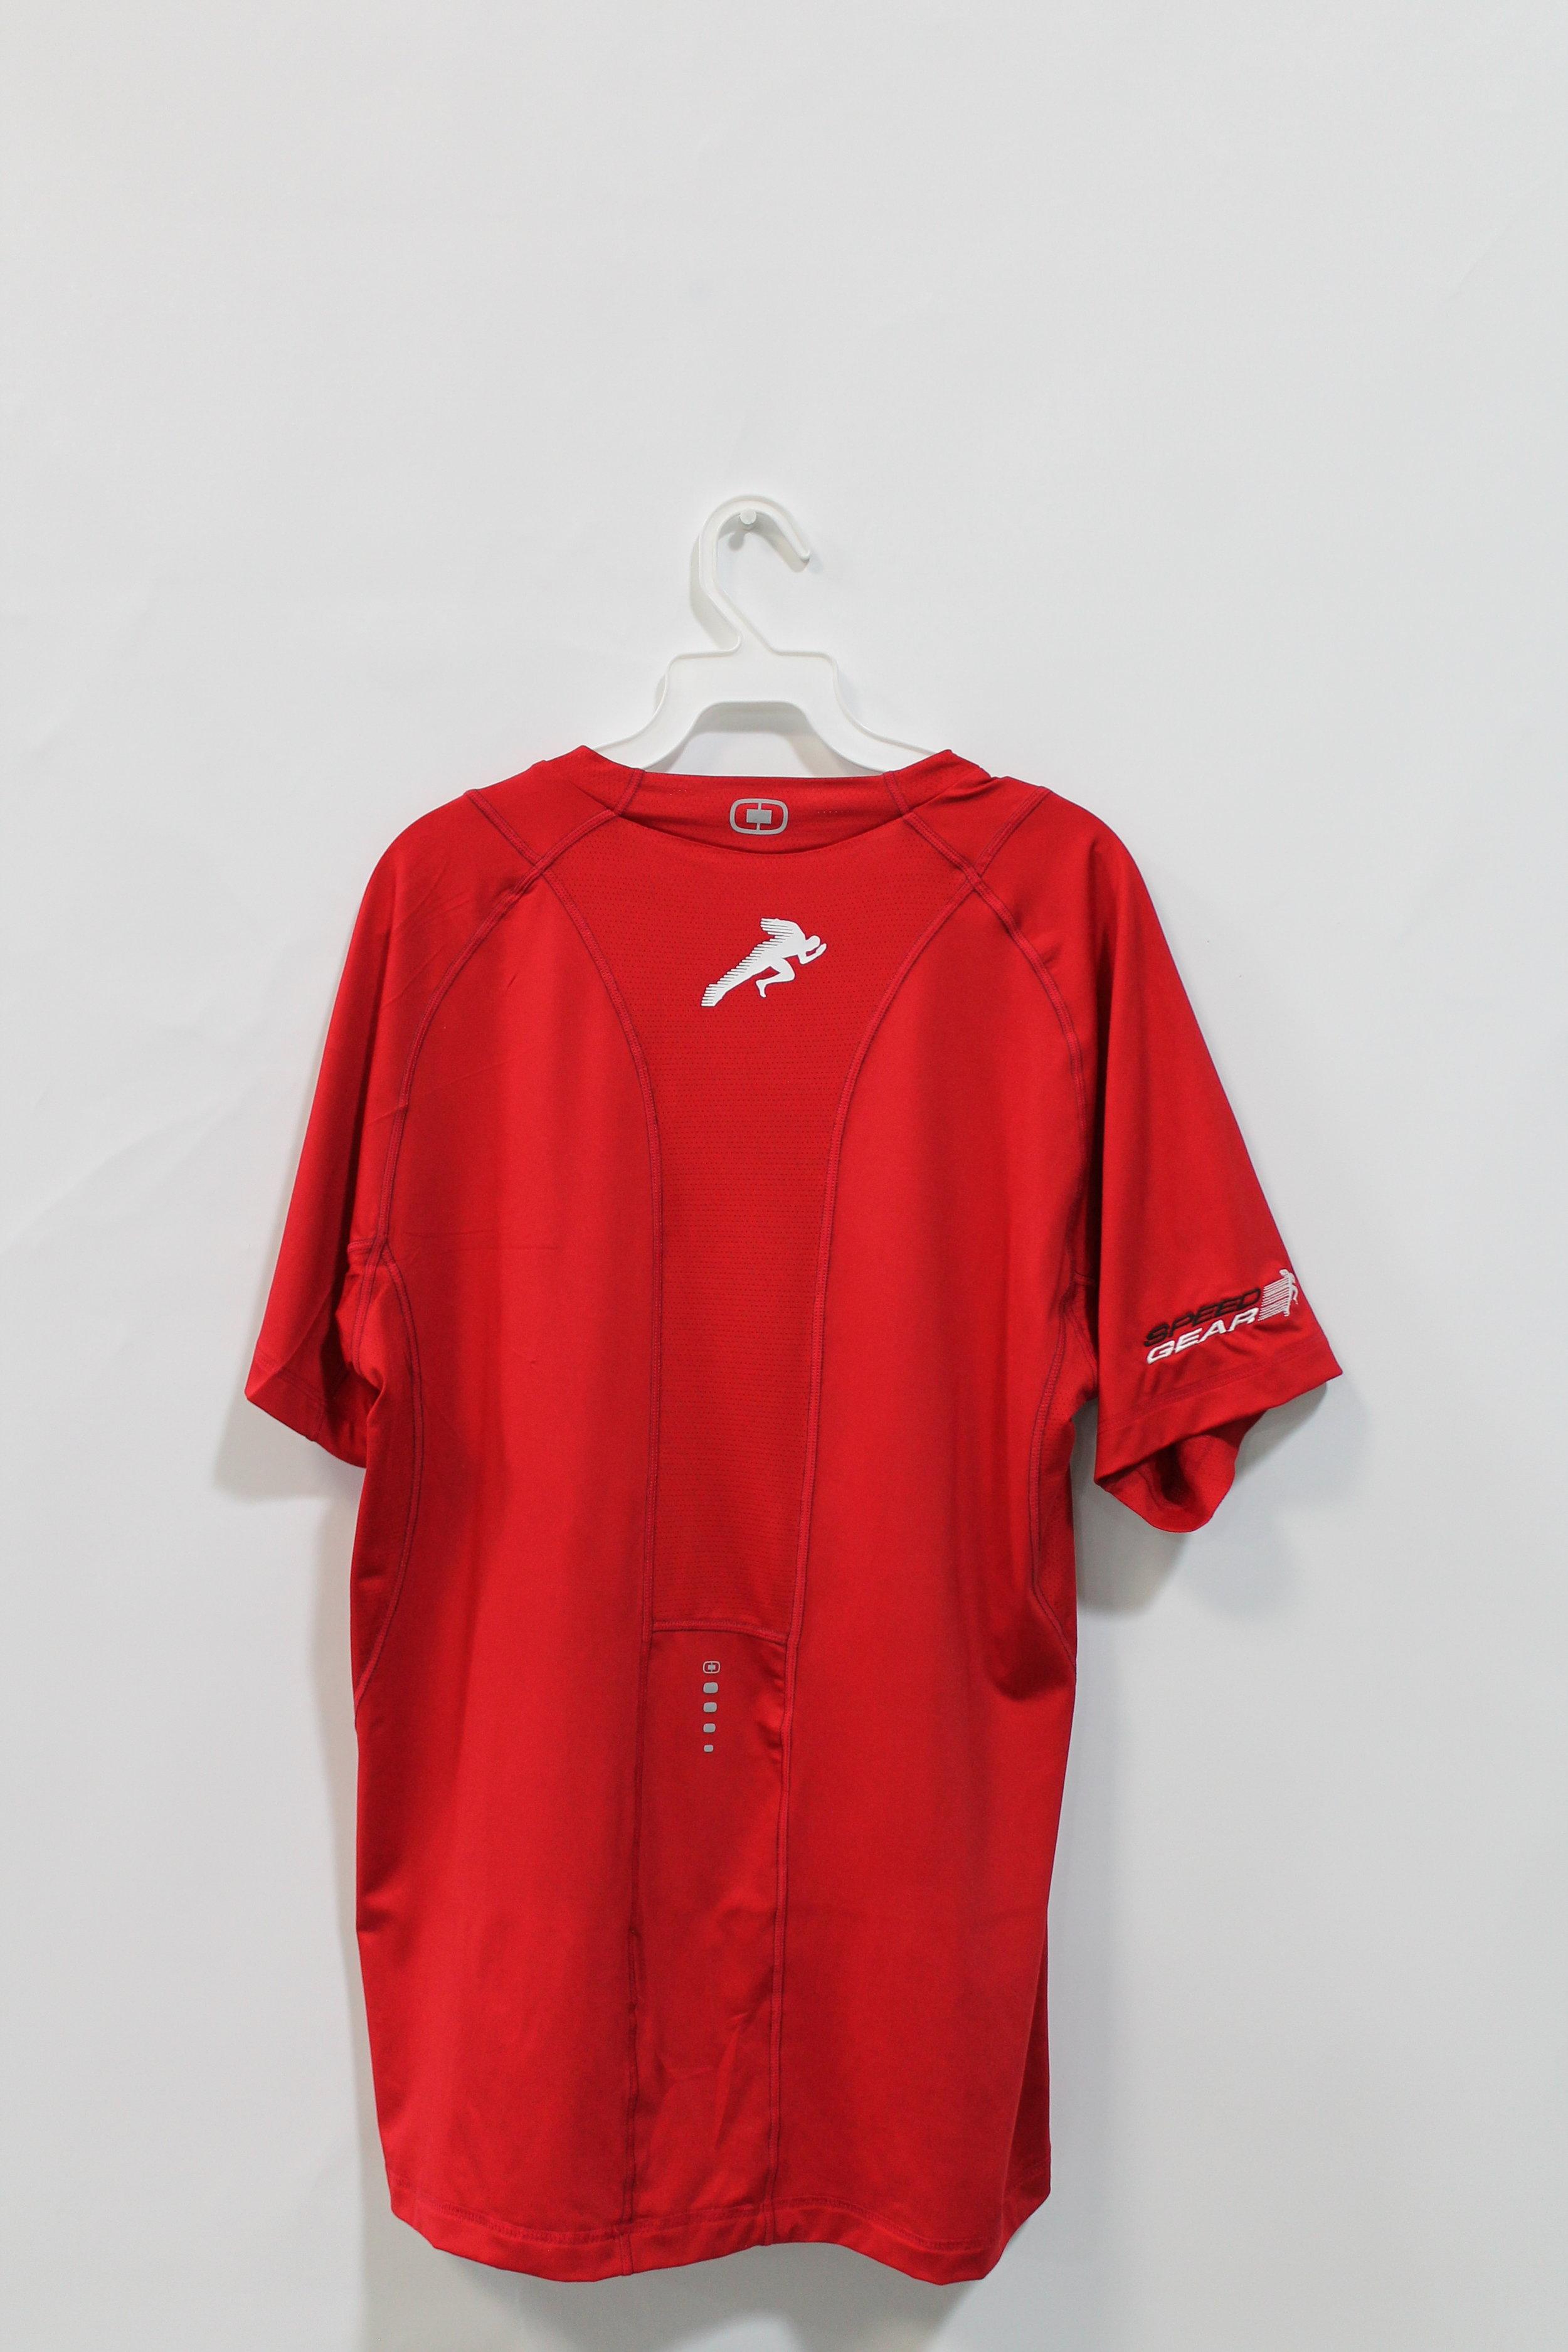 Running_Shirt_Back.JPG